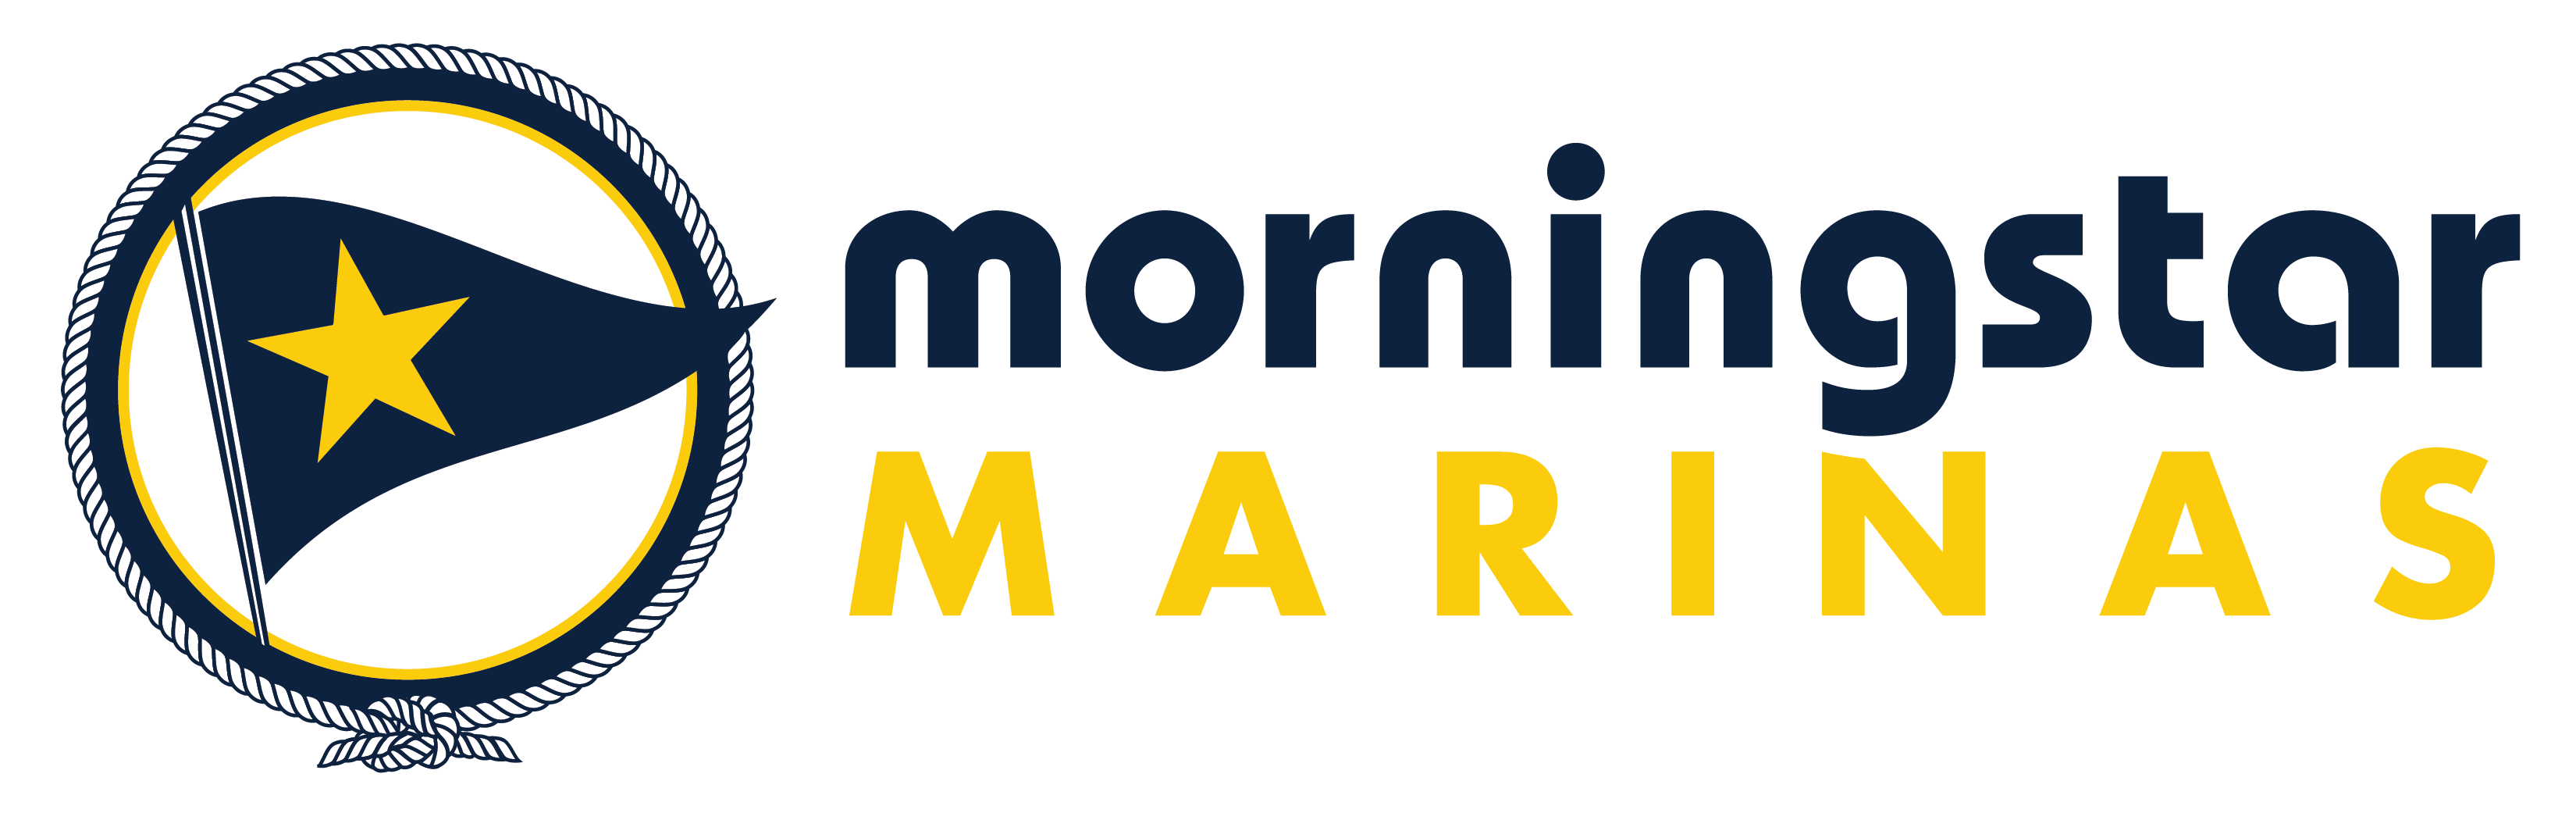 Morning star marina